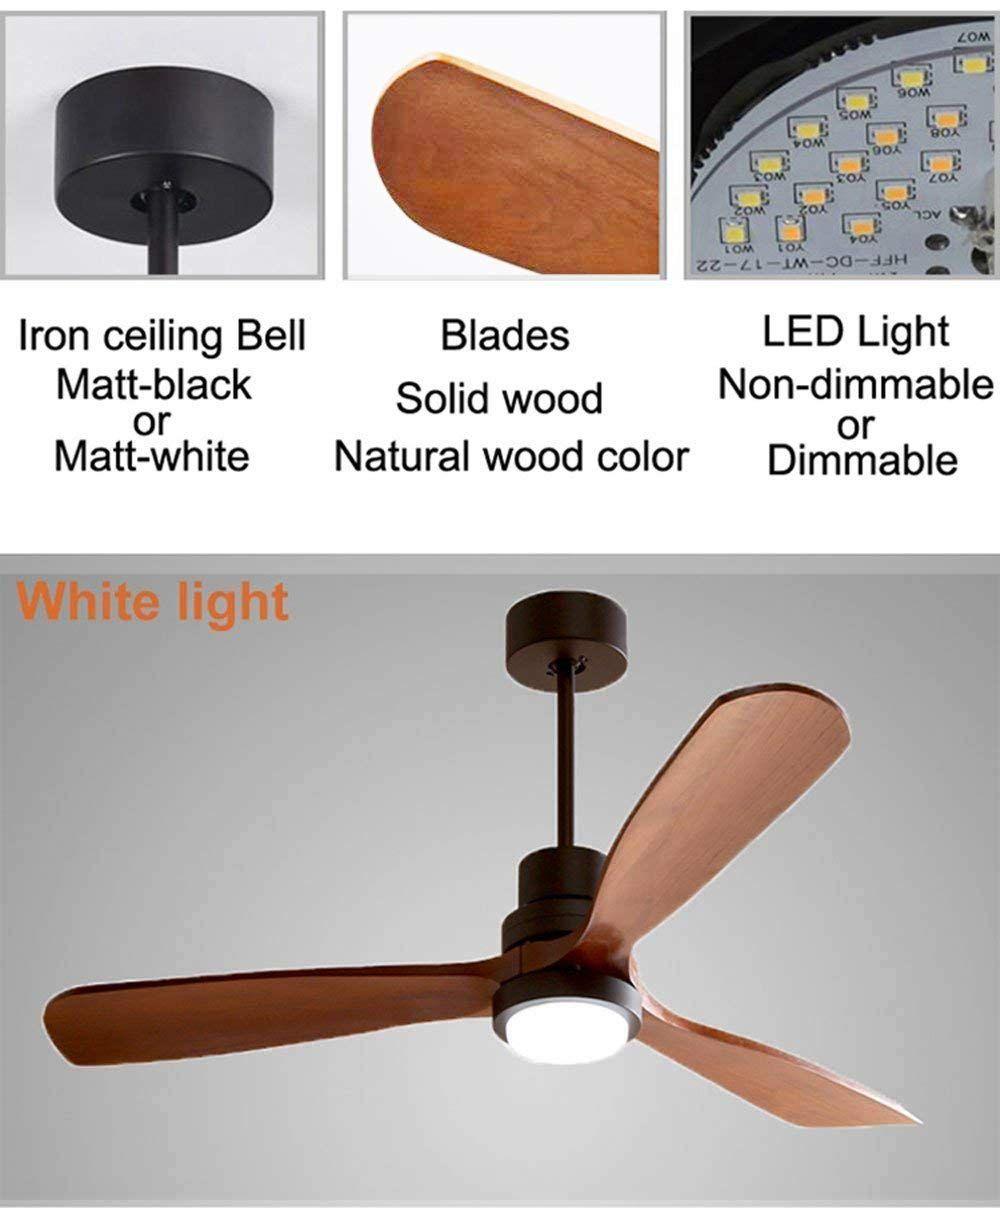 Yikui 52 Zoll Deckenventilator Licht Home Abs Holz Blatt Ventilator Beleuchtung Dekorative Licht Schlafzimmer 12w Led Lic Deckenventilator Ventilator Led Licht